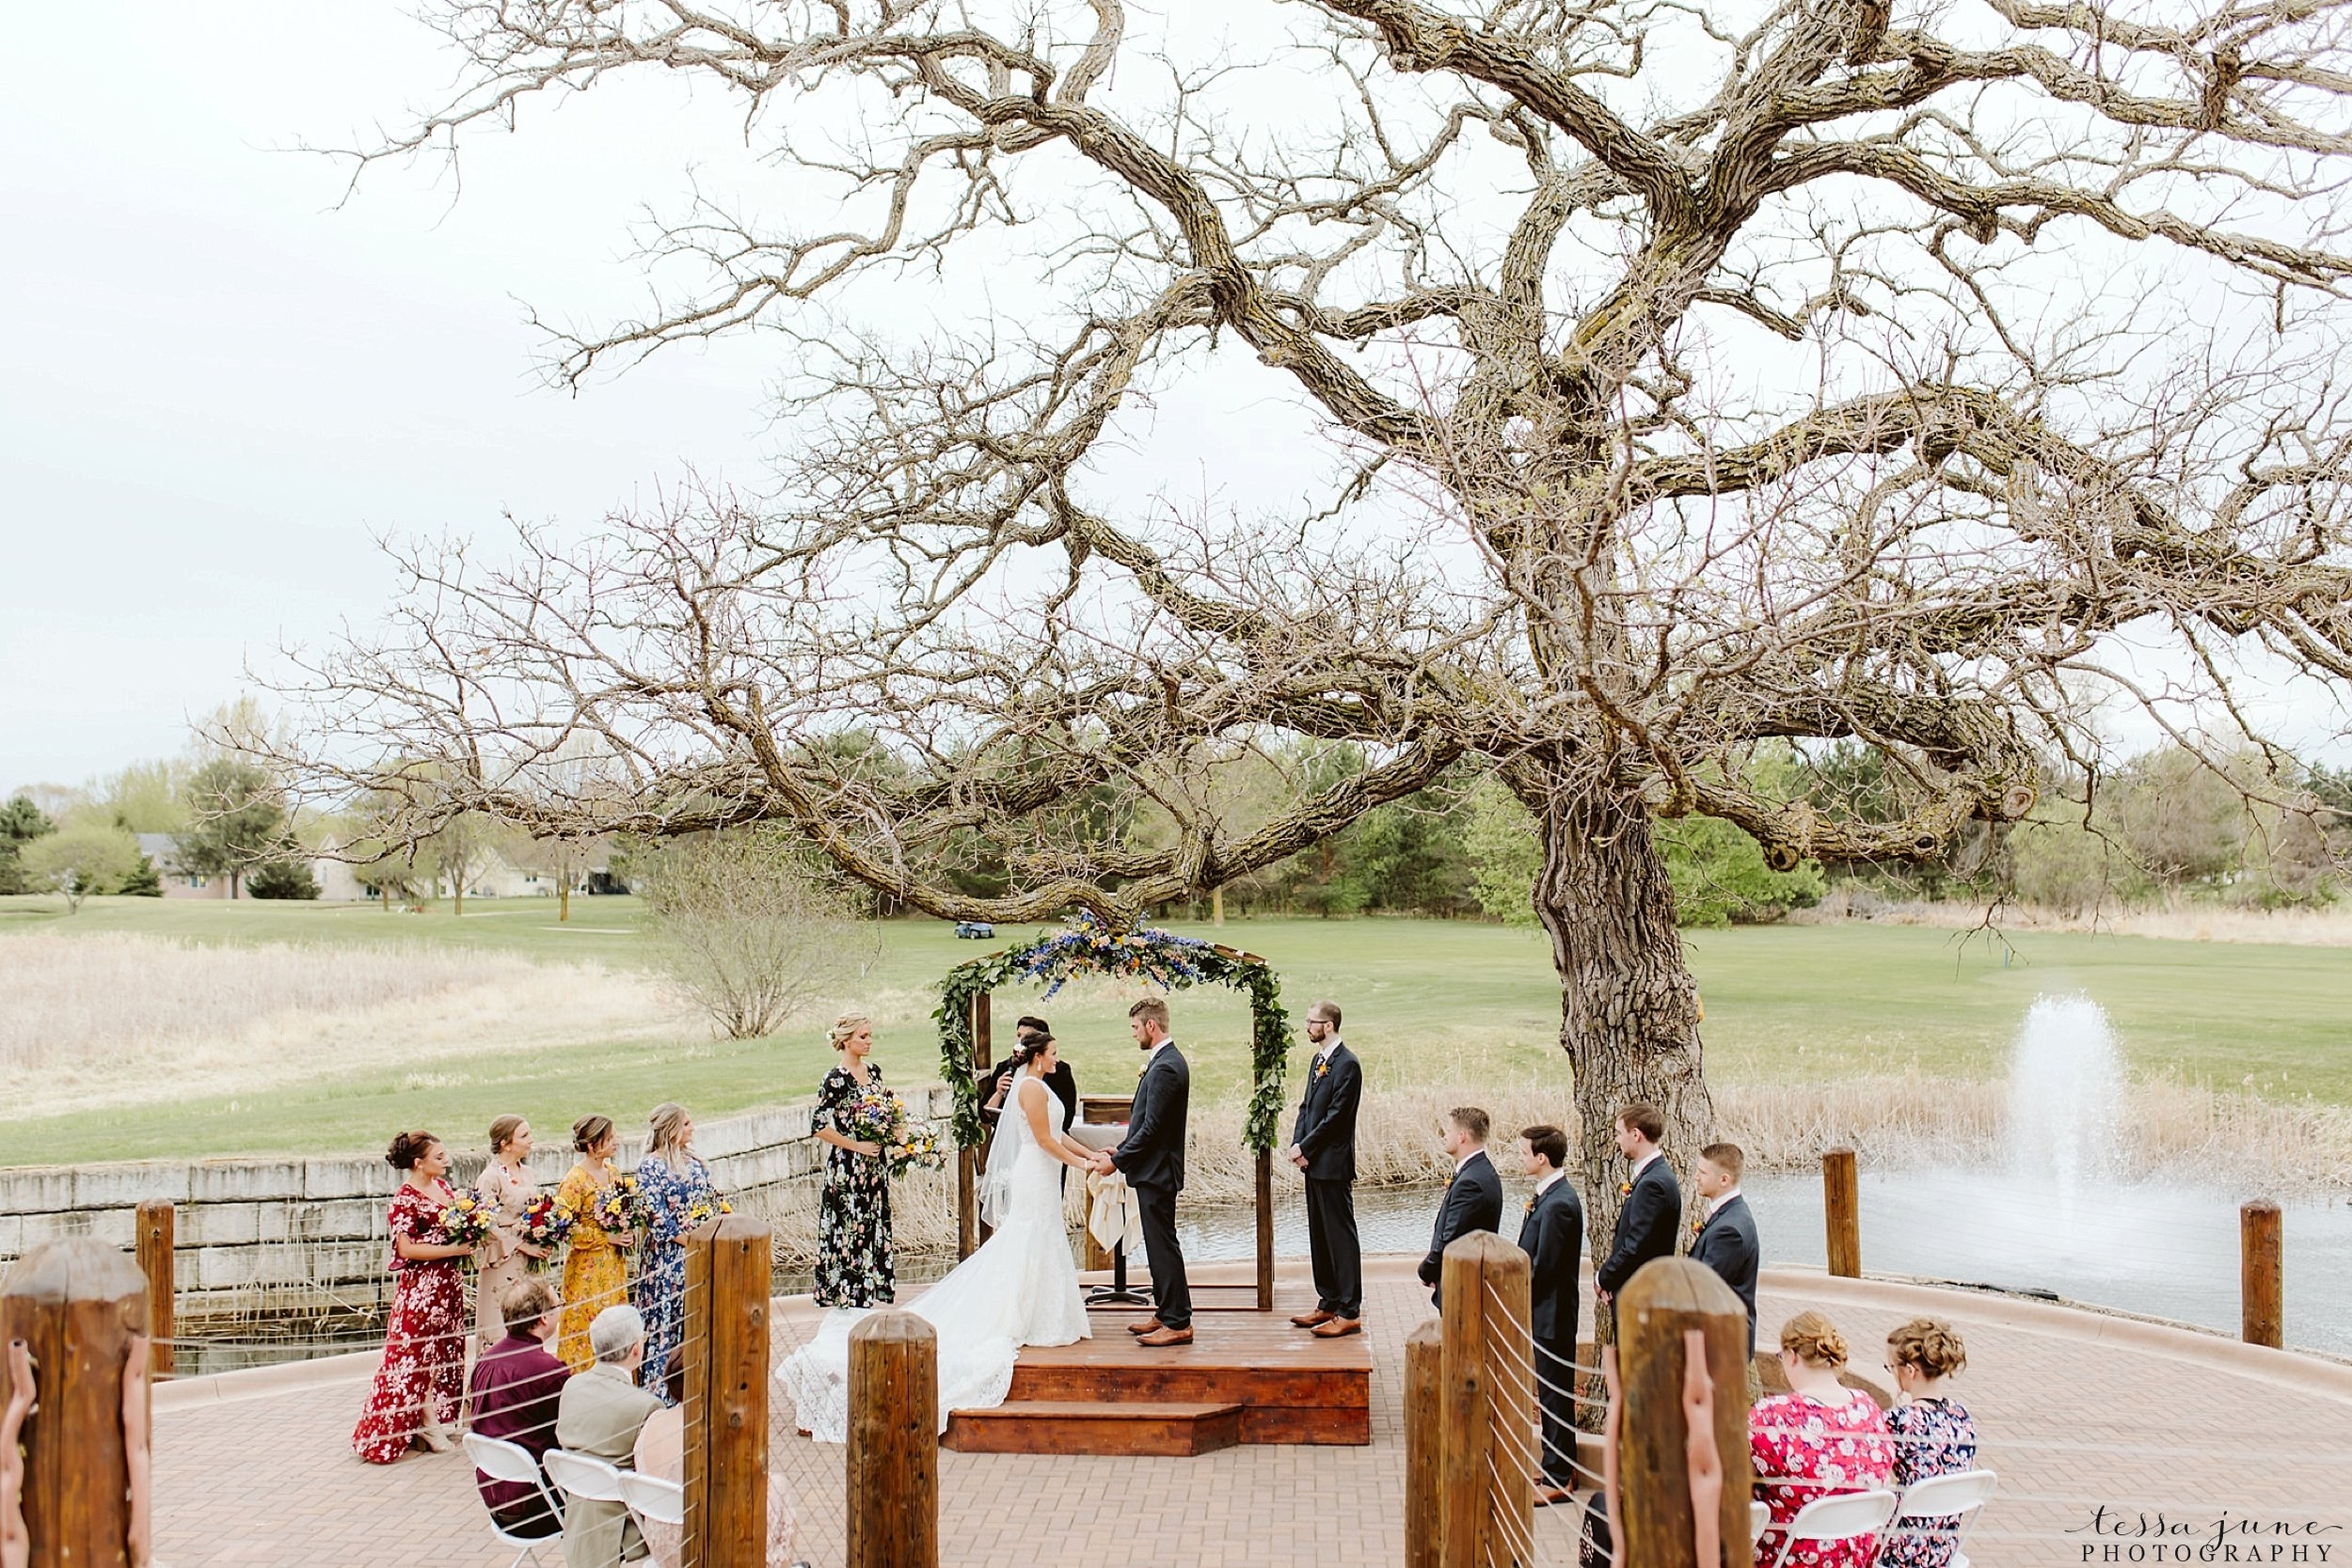 The-grands-at-mulligans-wedding-sartell-minnesota-spring-floral-spring-garden-wedding-90.jpg